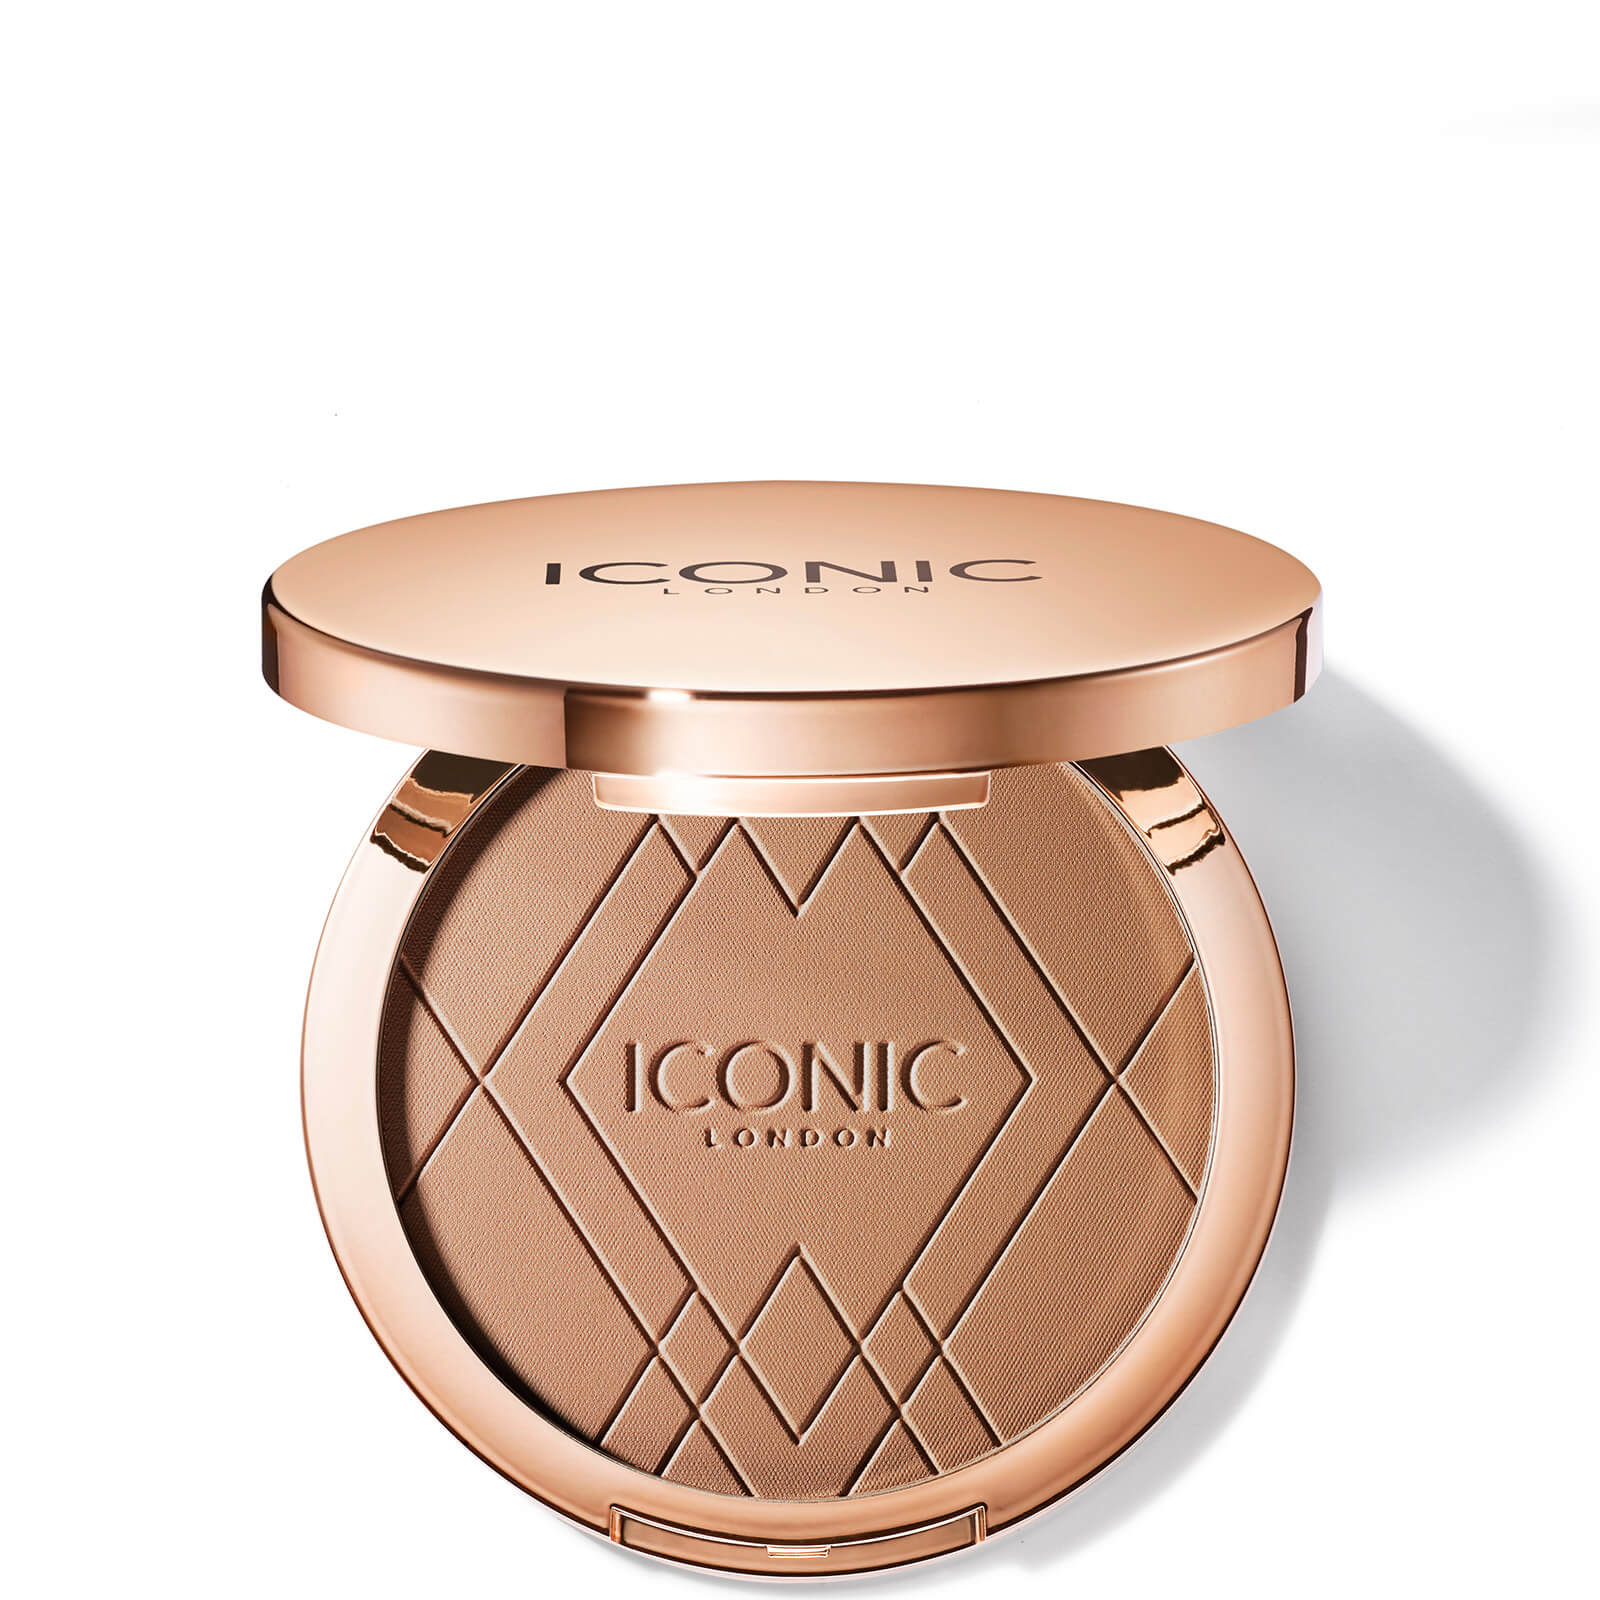 Купить ICONIC London Ultimate Bronzing Powder 17g (Various Shades) - Medium Bronze